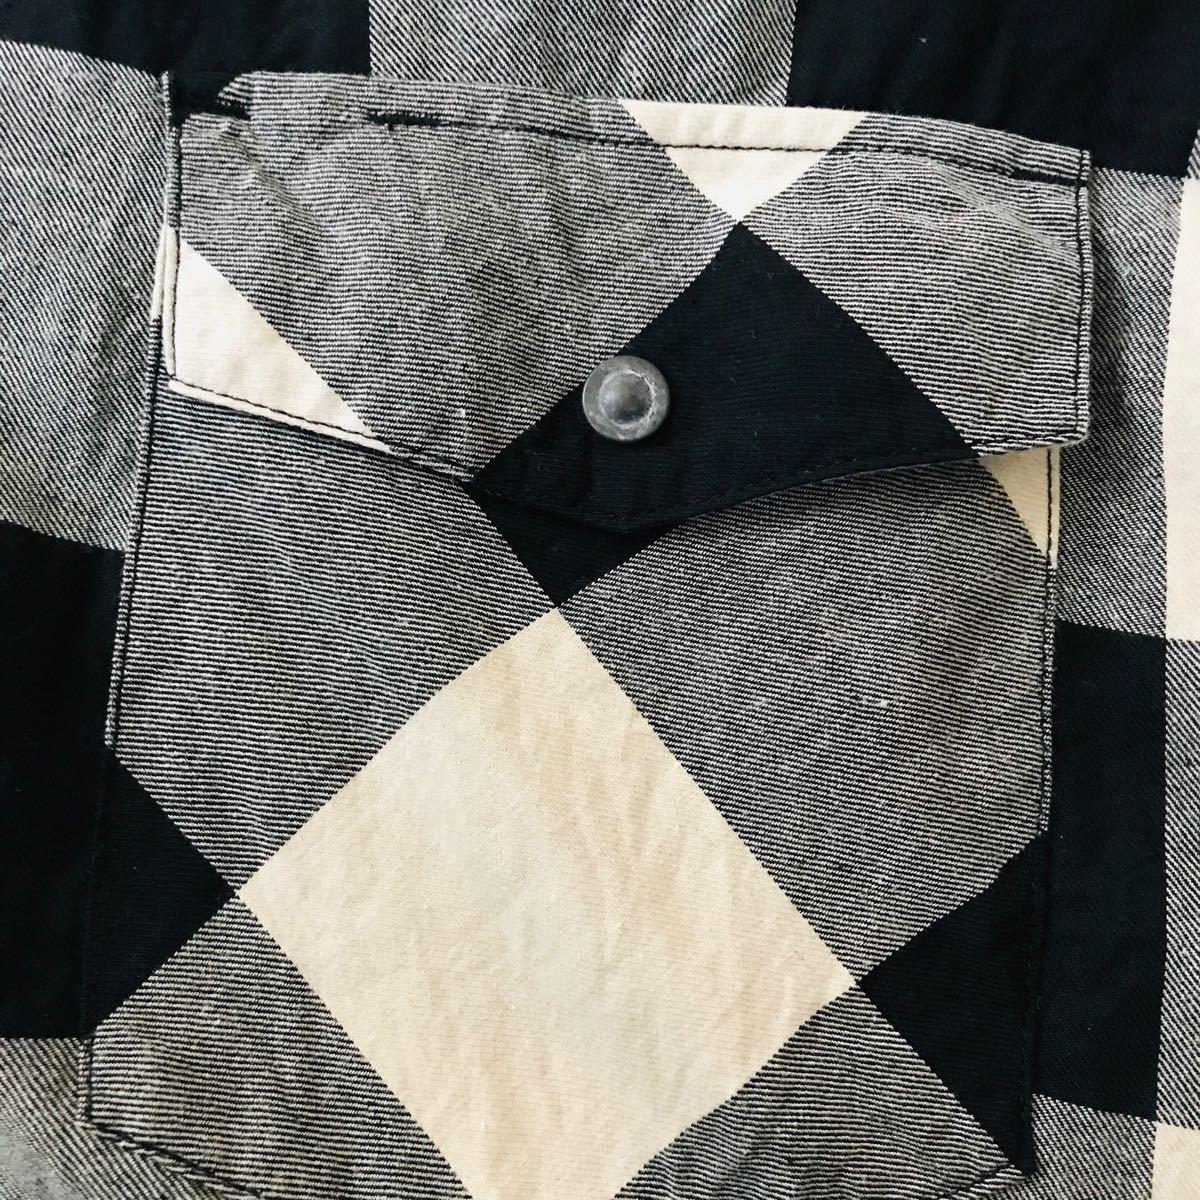 schott  チェック柄 シャツ 半袖 メンズ L